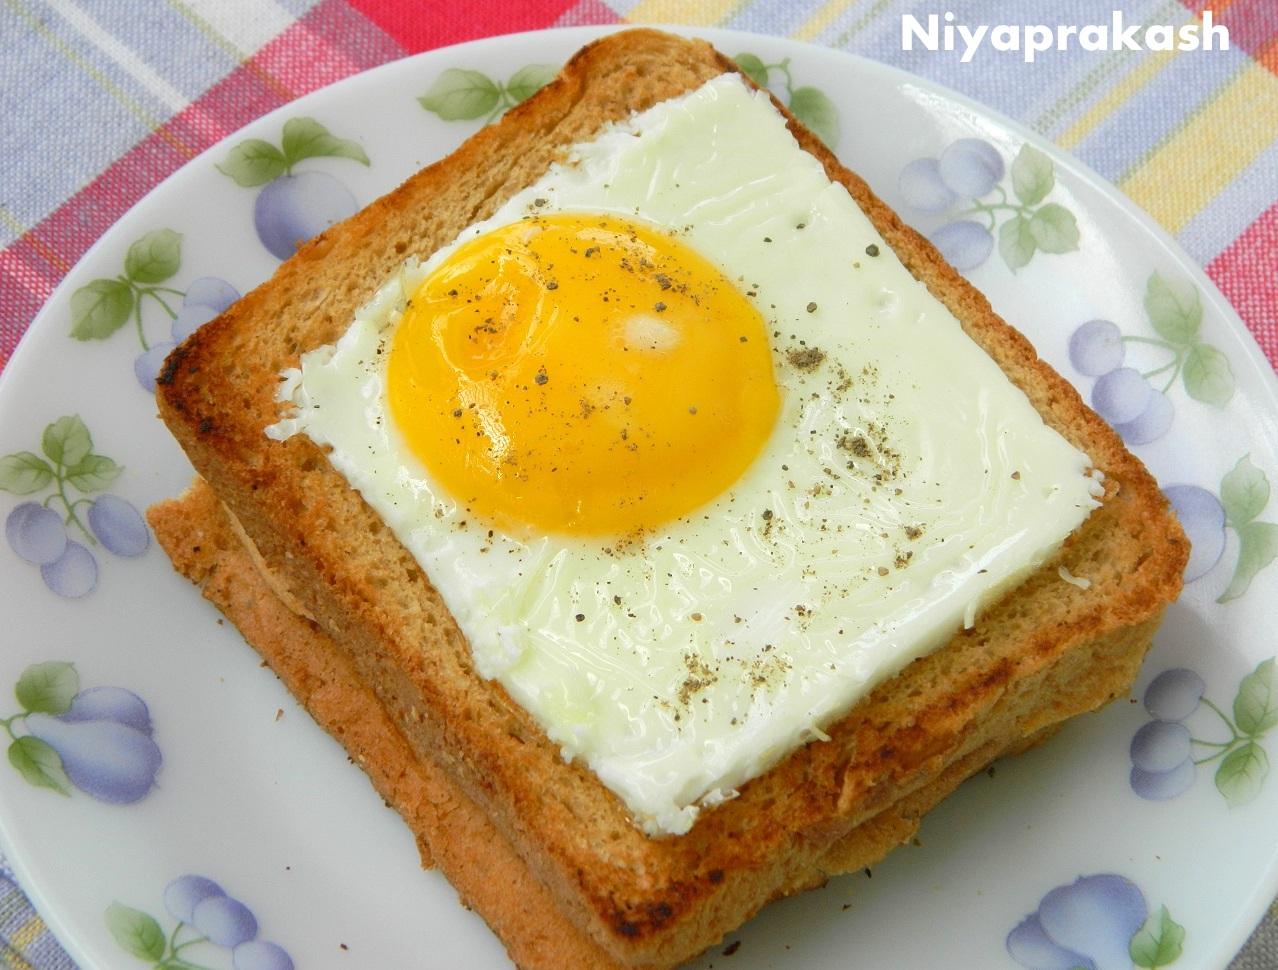 Niya's World: Photos of Homemade Dishes (Egg ring, Fried